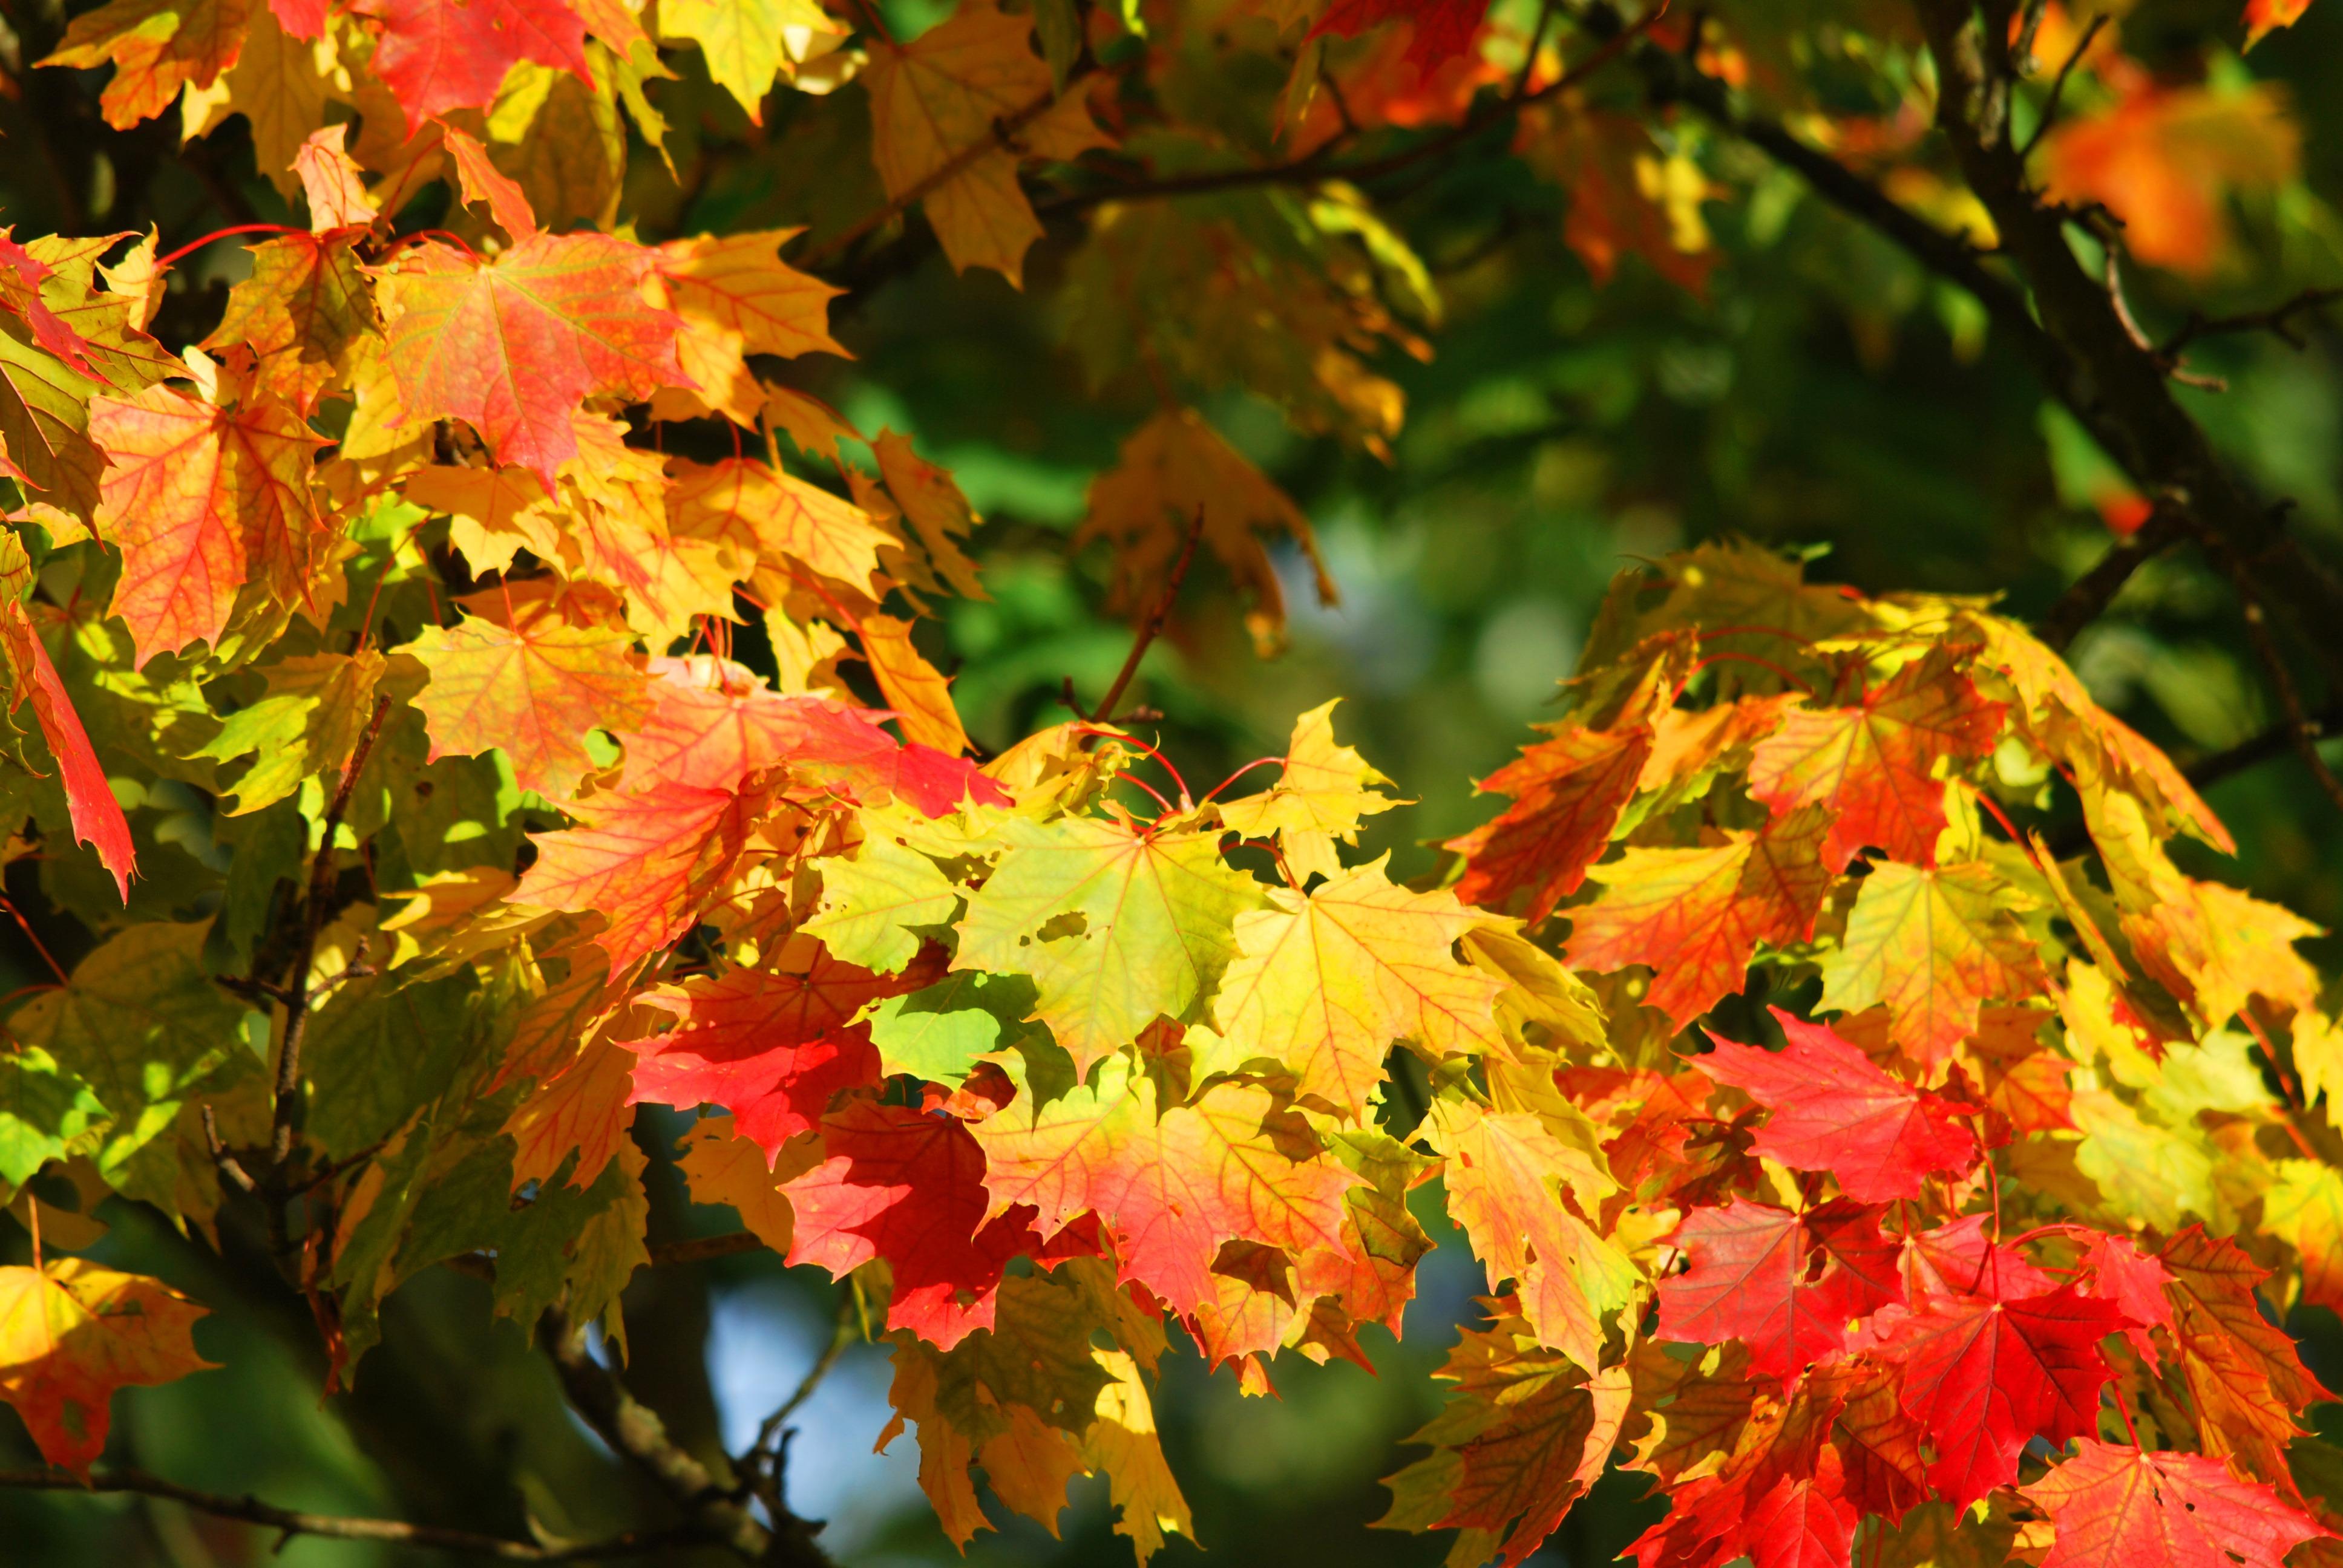 autumn-tree-leaves-red-63614_pexels